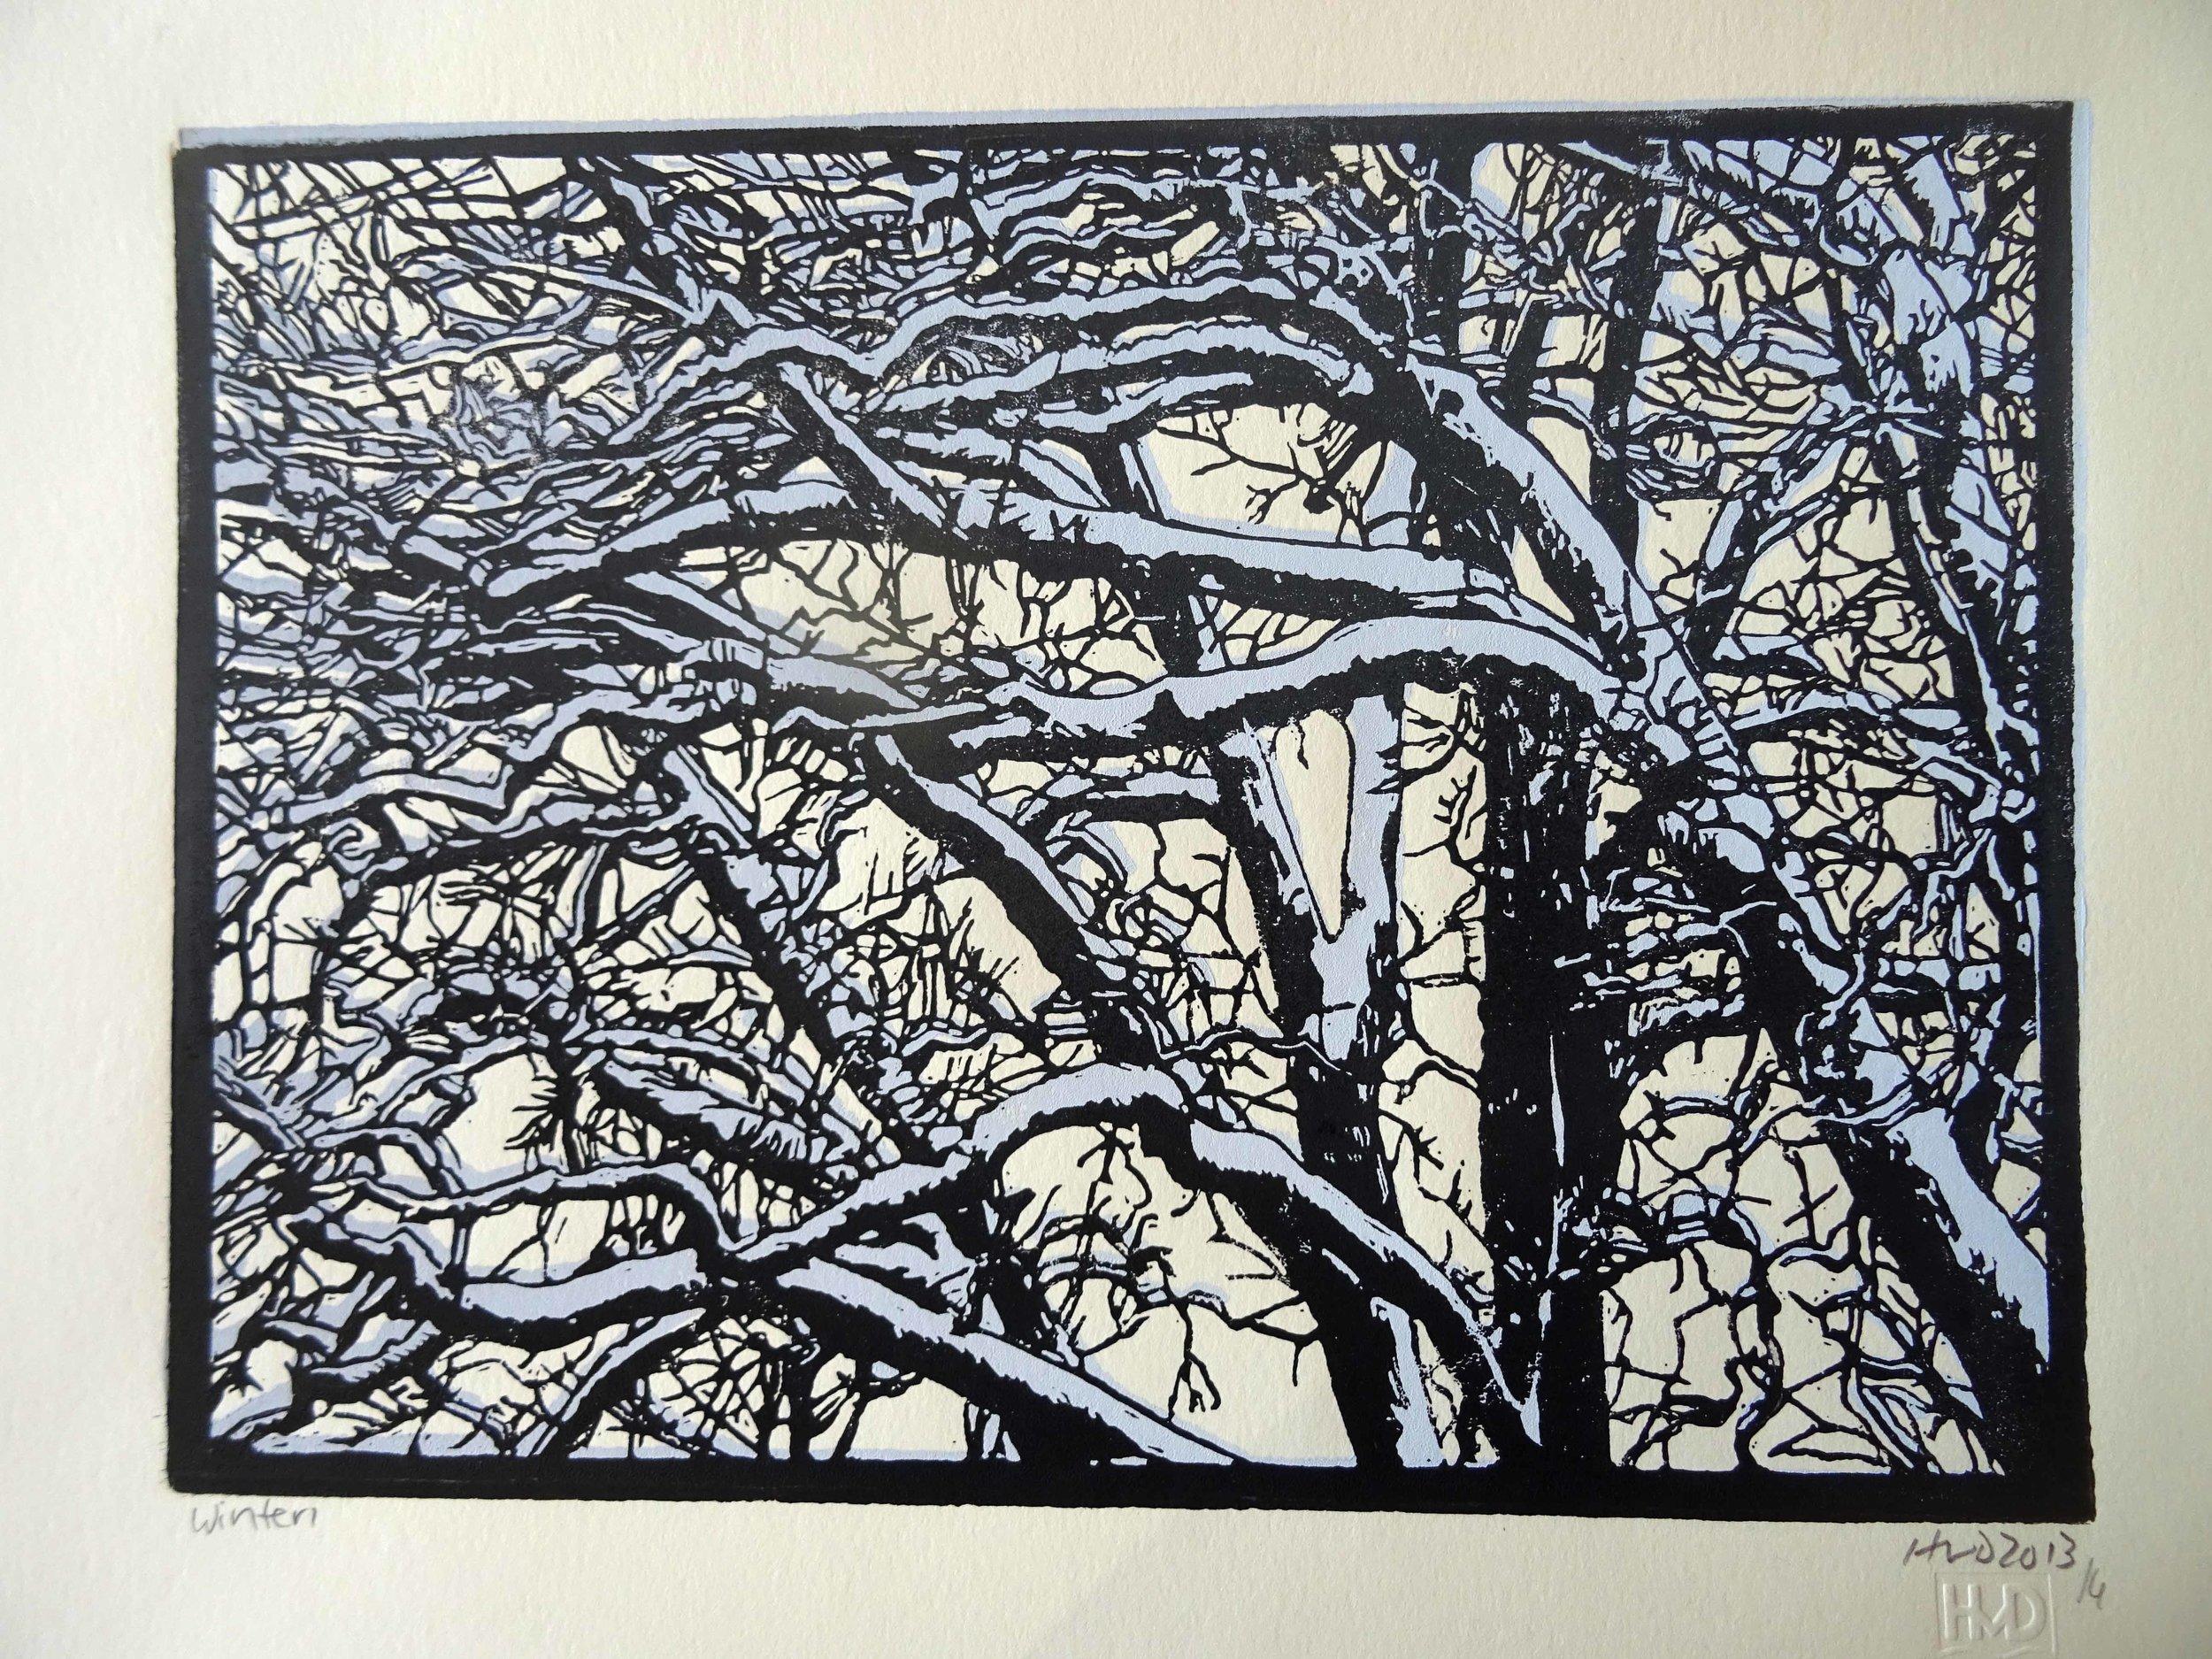 135-3, winter trees, 21x30 cm, 2-plate lino, 60 €